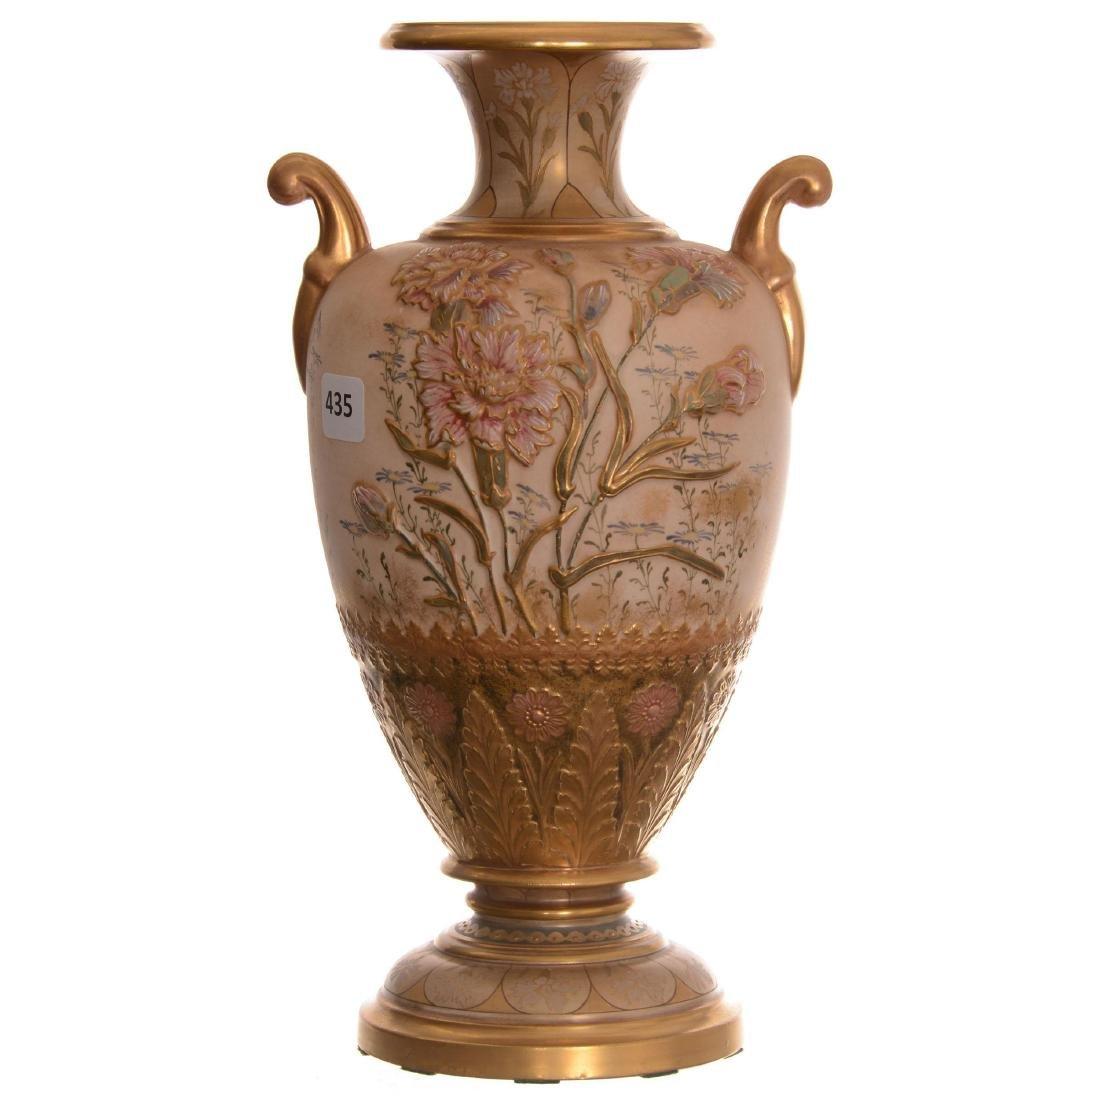 Pedestal Doulton Burslem Vase